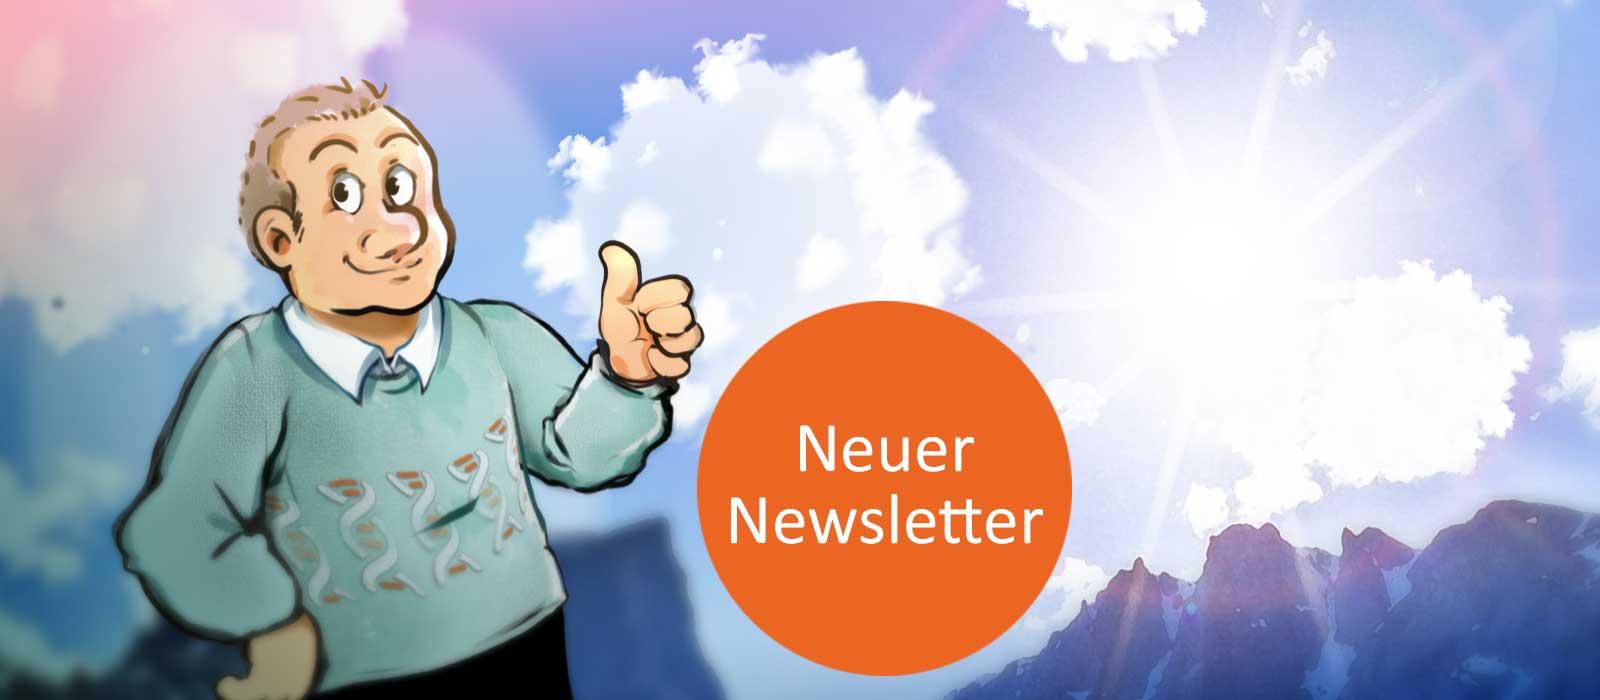 ALpha1-Mann - Ankündigung neuer Newsletter